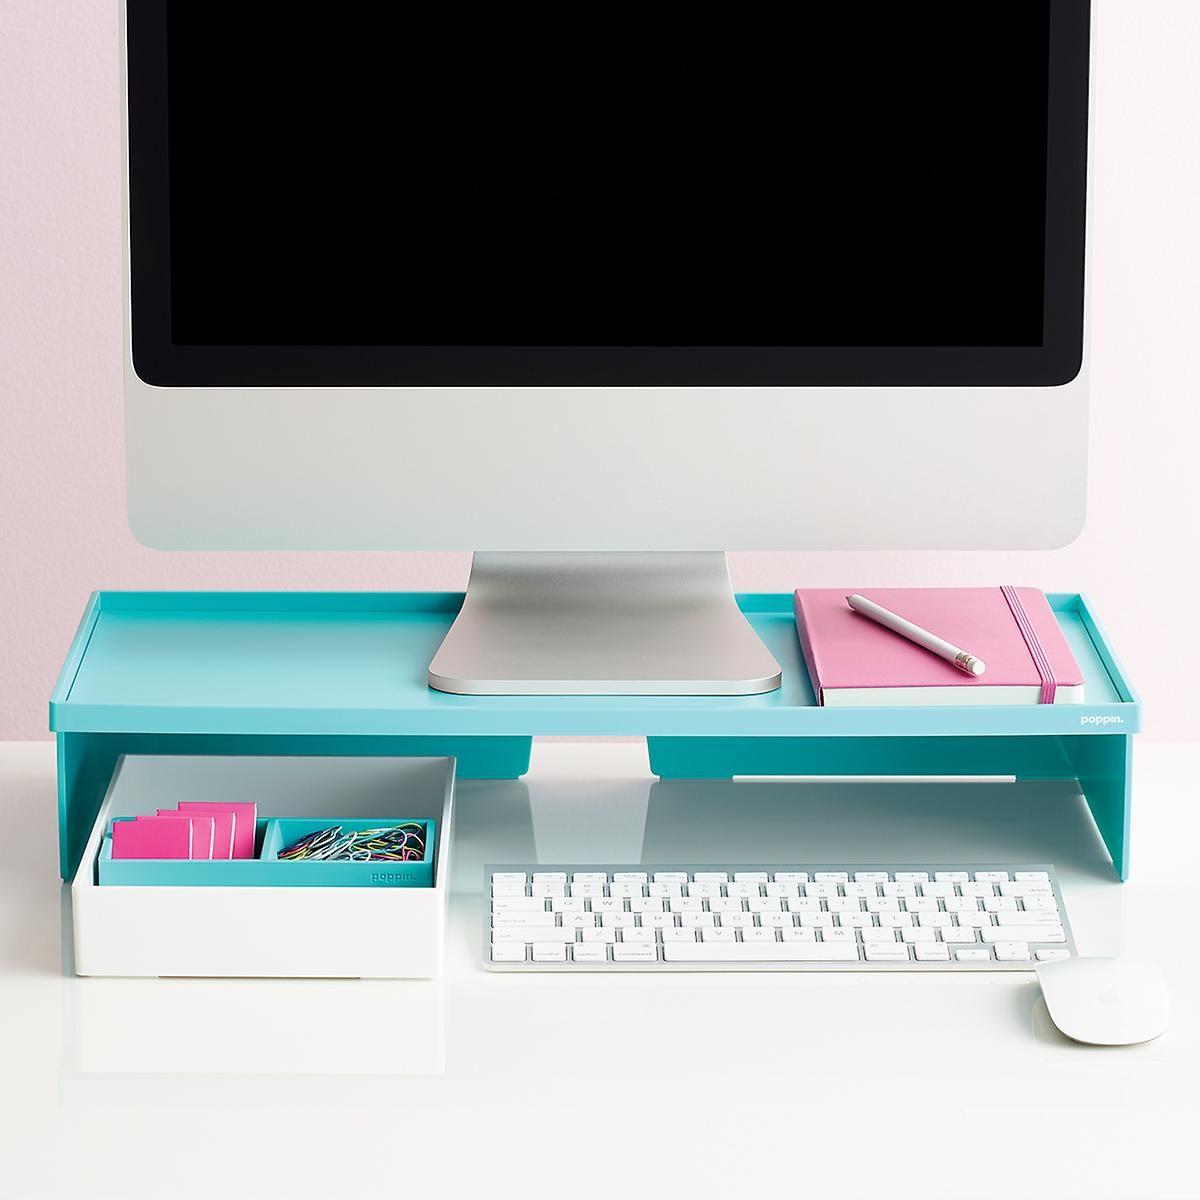 aqua poppin monitor stand in 2019 career monitor stand desk rh pinterest com